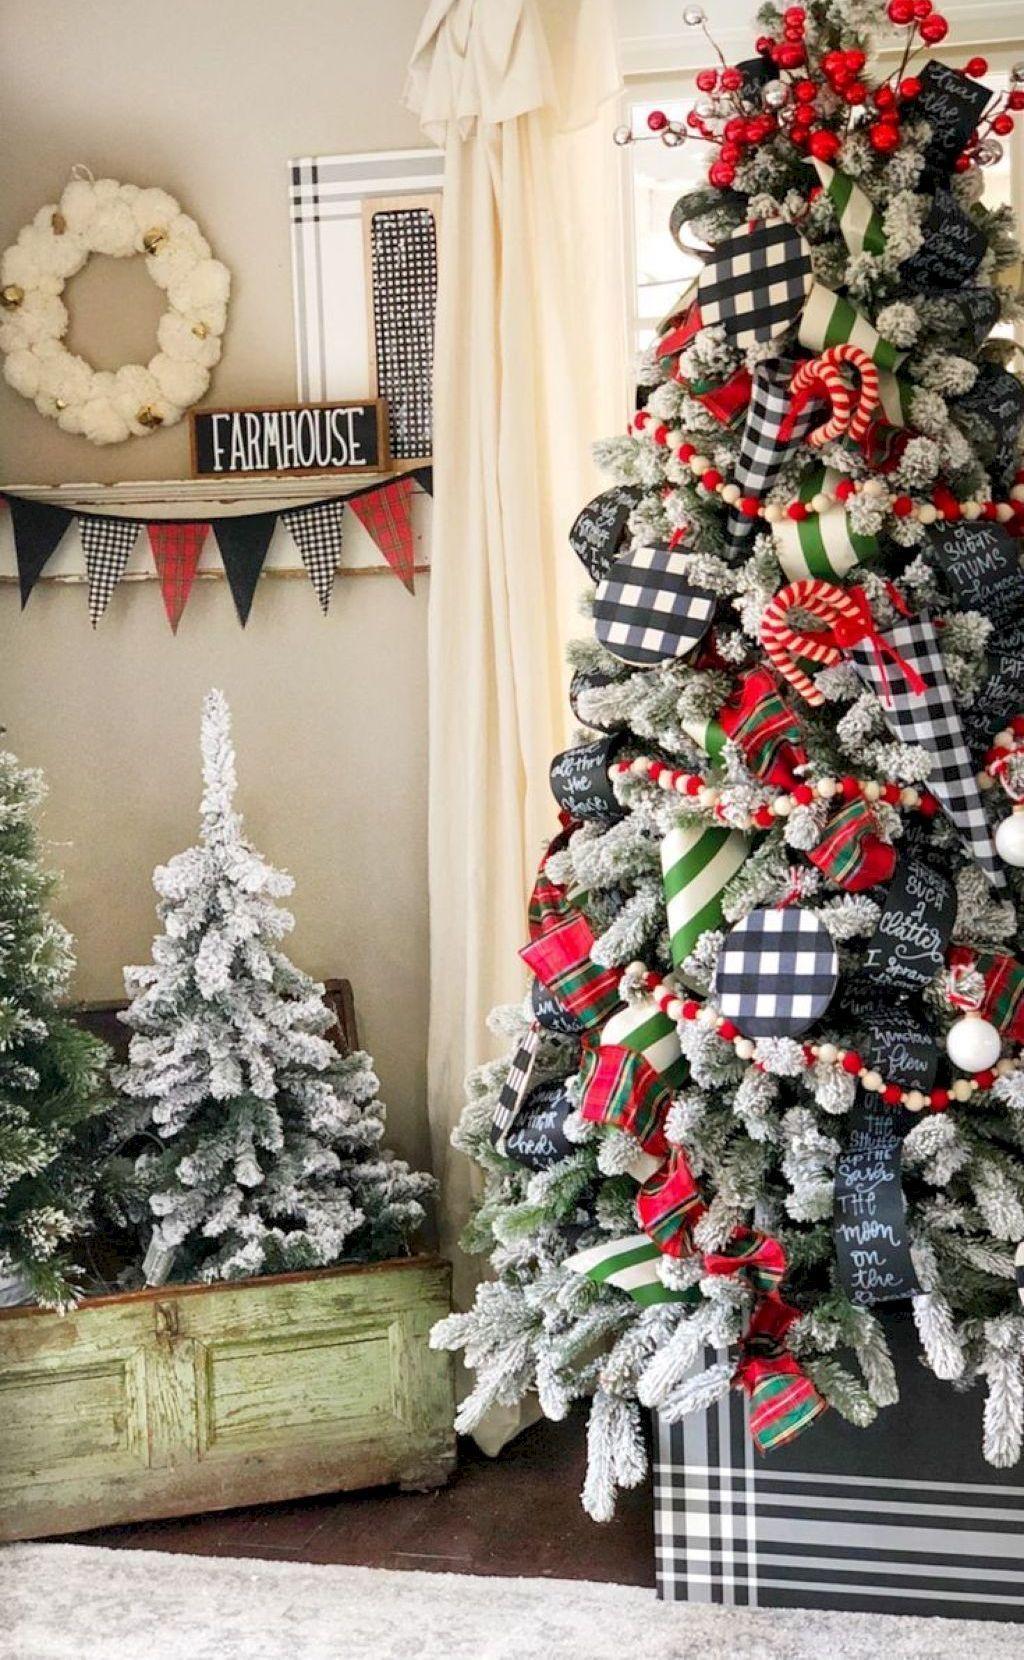 2019 Christmas Tree Decoration Ideas White Christmas Tree Christmas Tree Themes F Christmas Tree Themes Christmas Decorations Rustic Tree Christmas Tree Shop